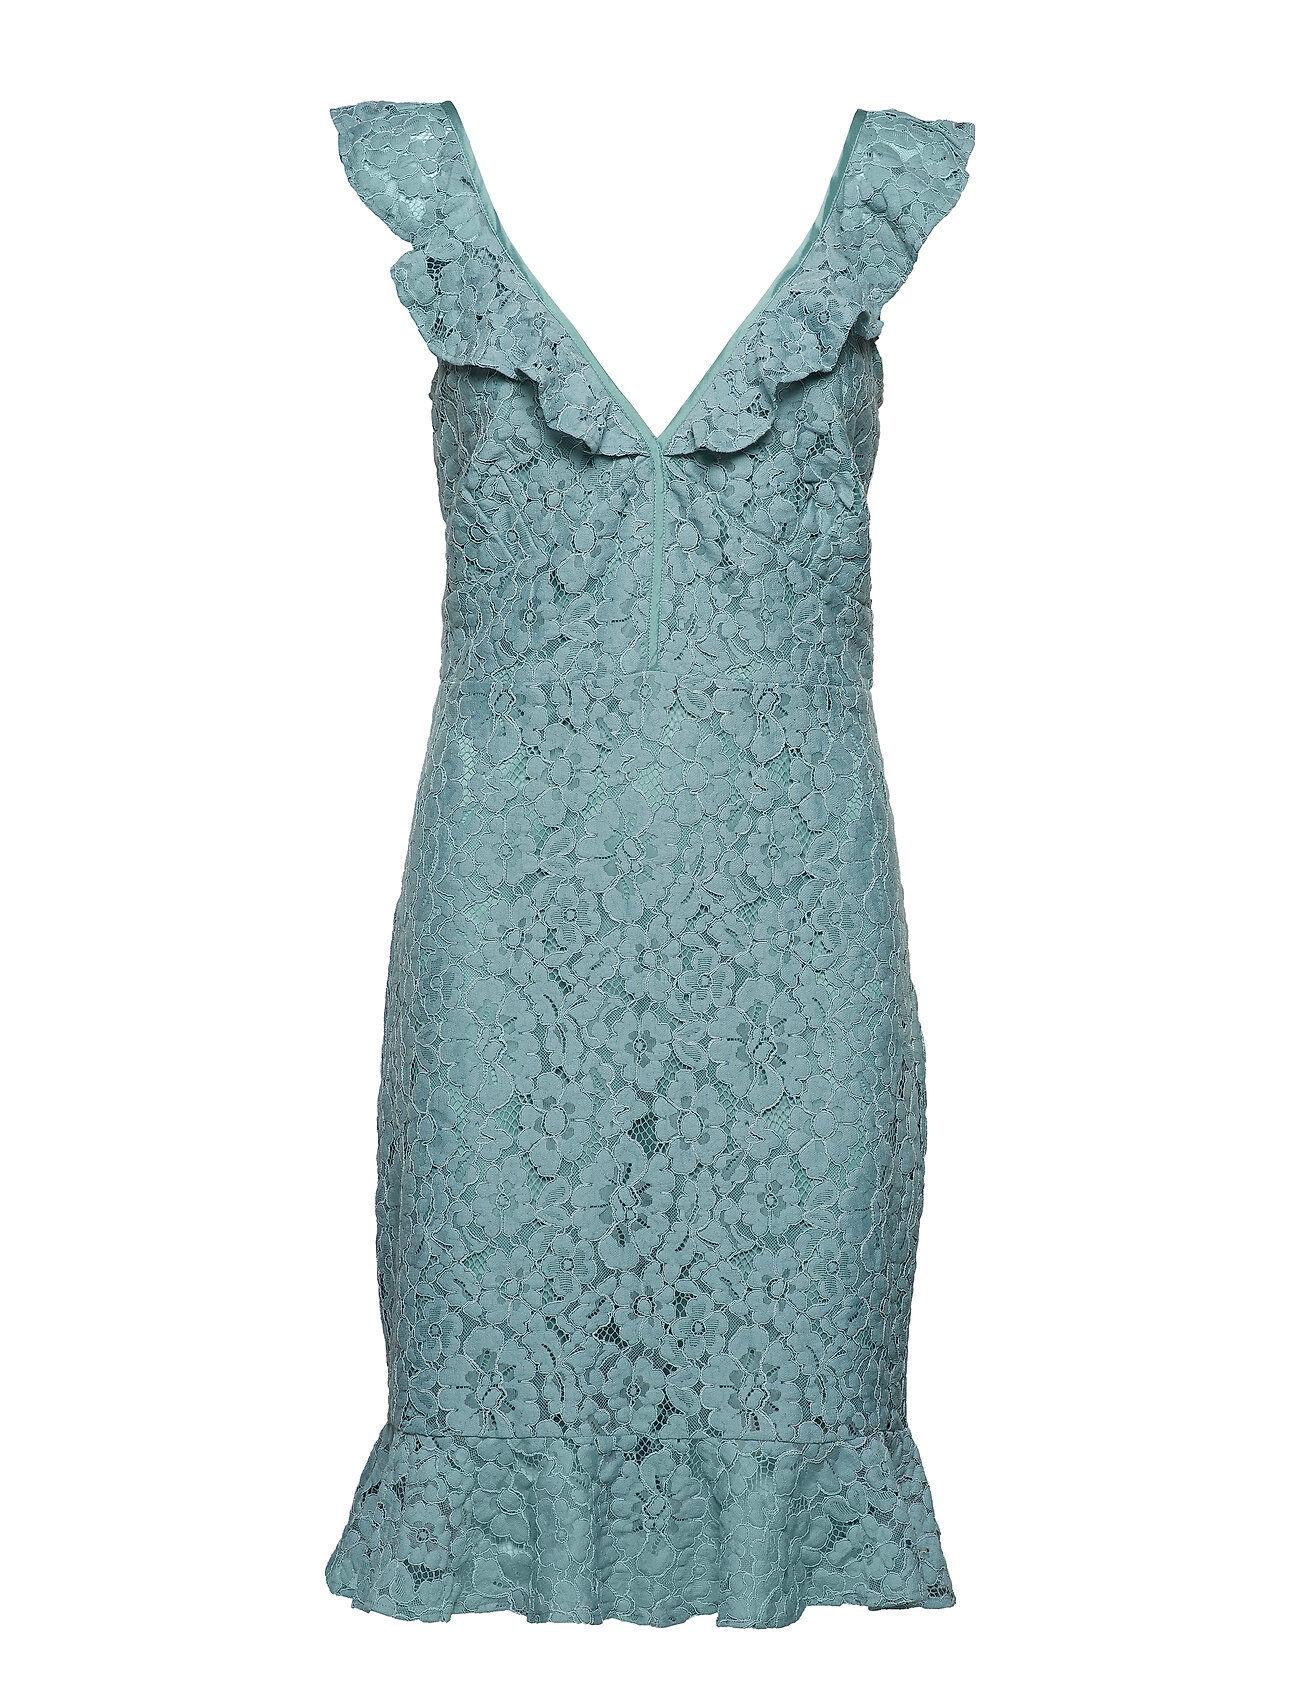 Valerie Nello Dress